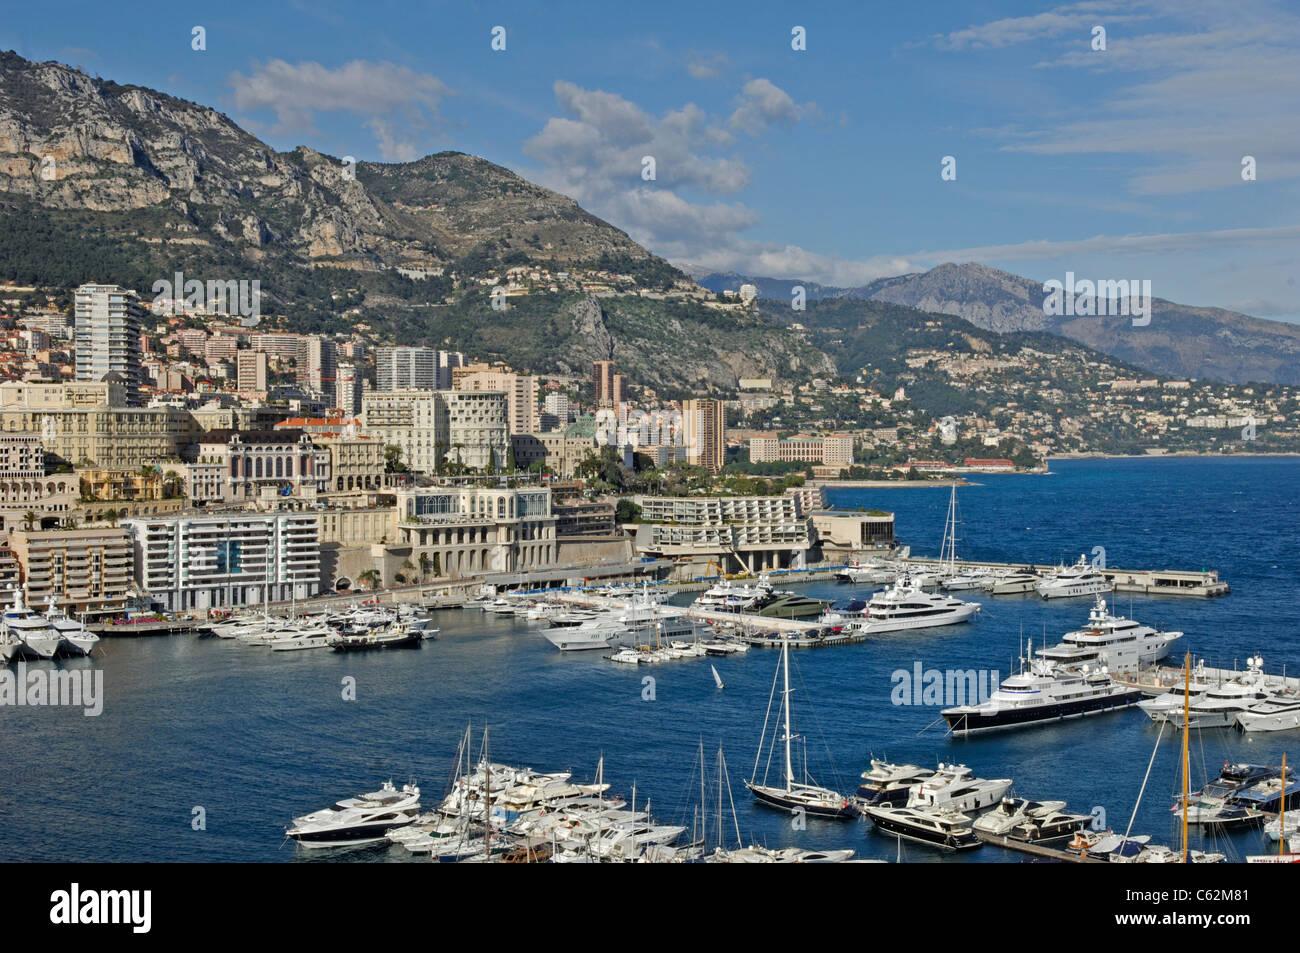 Monte Carlo harbour, Port Hercule, Principality of Monaco - Stock Image